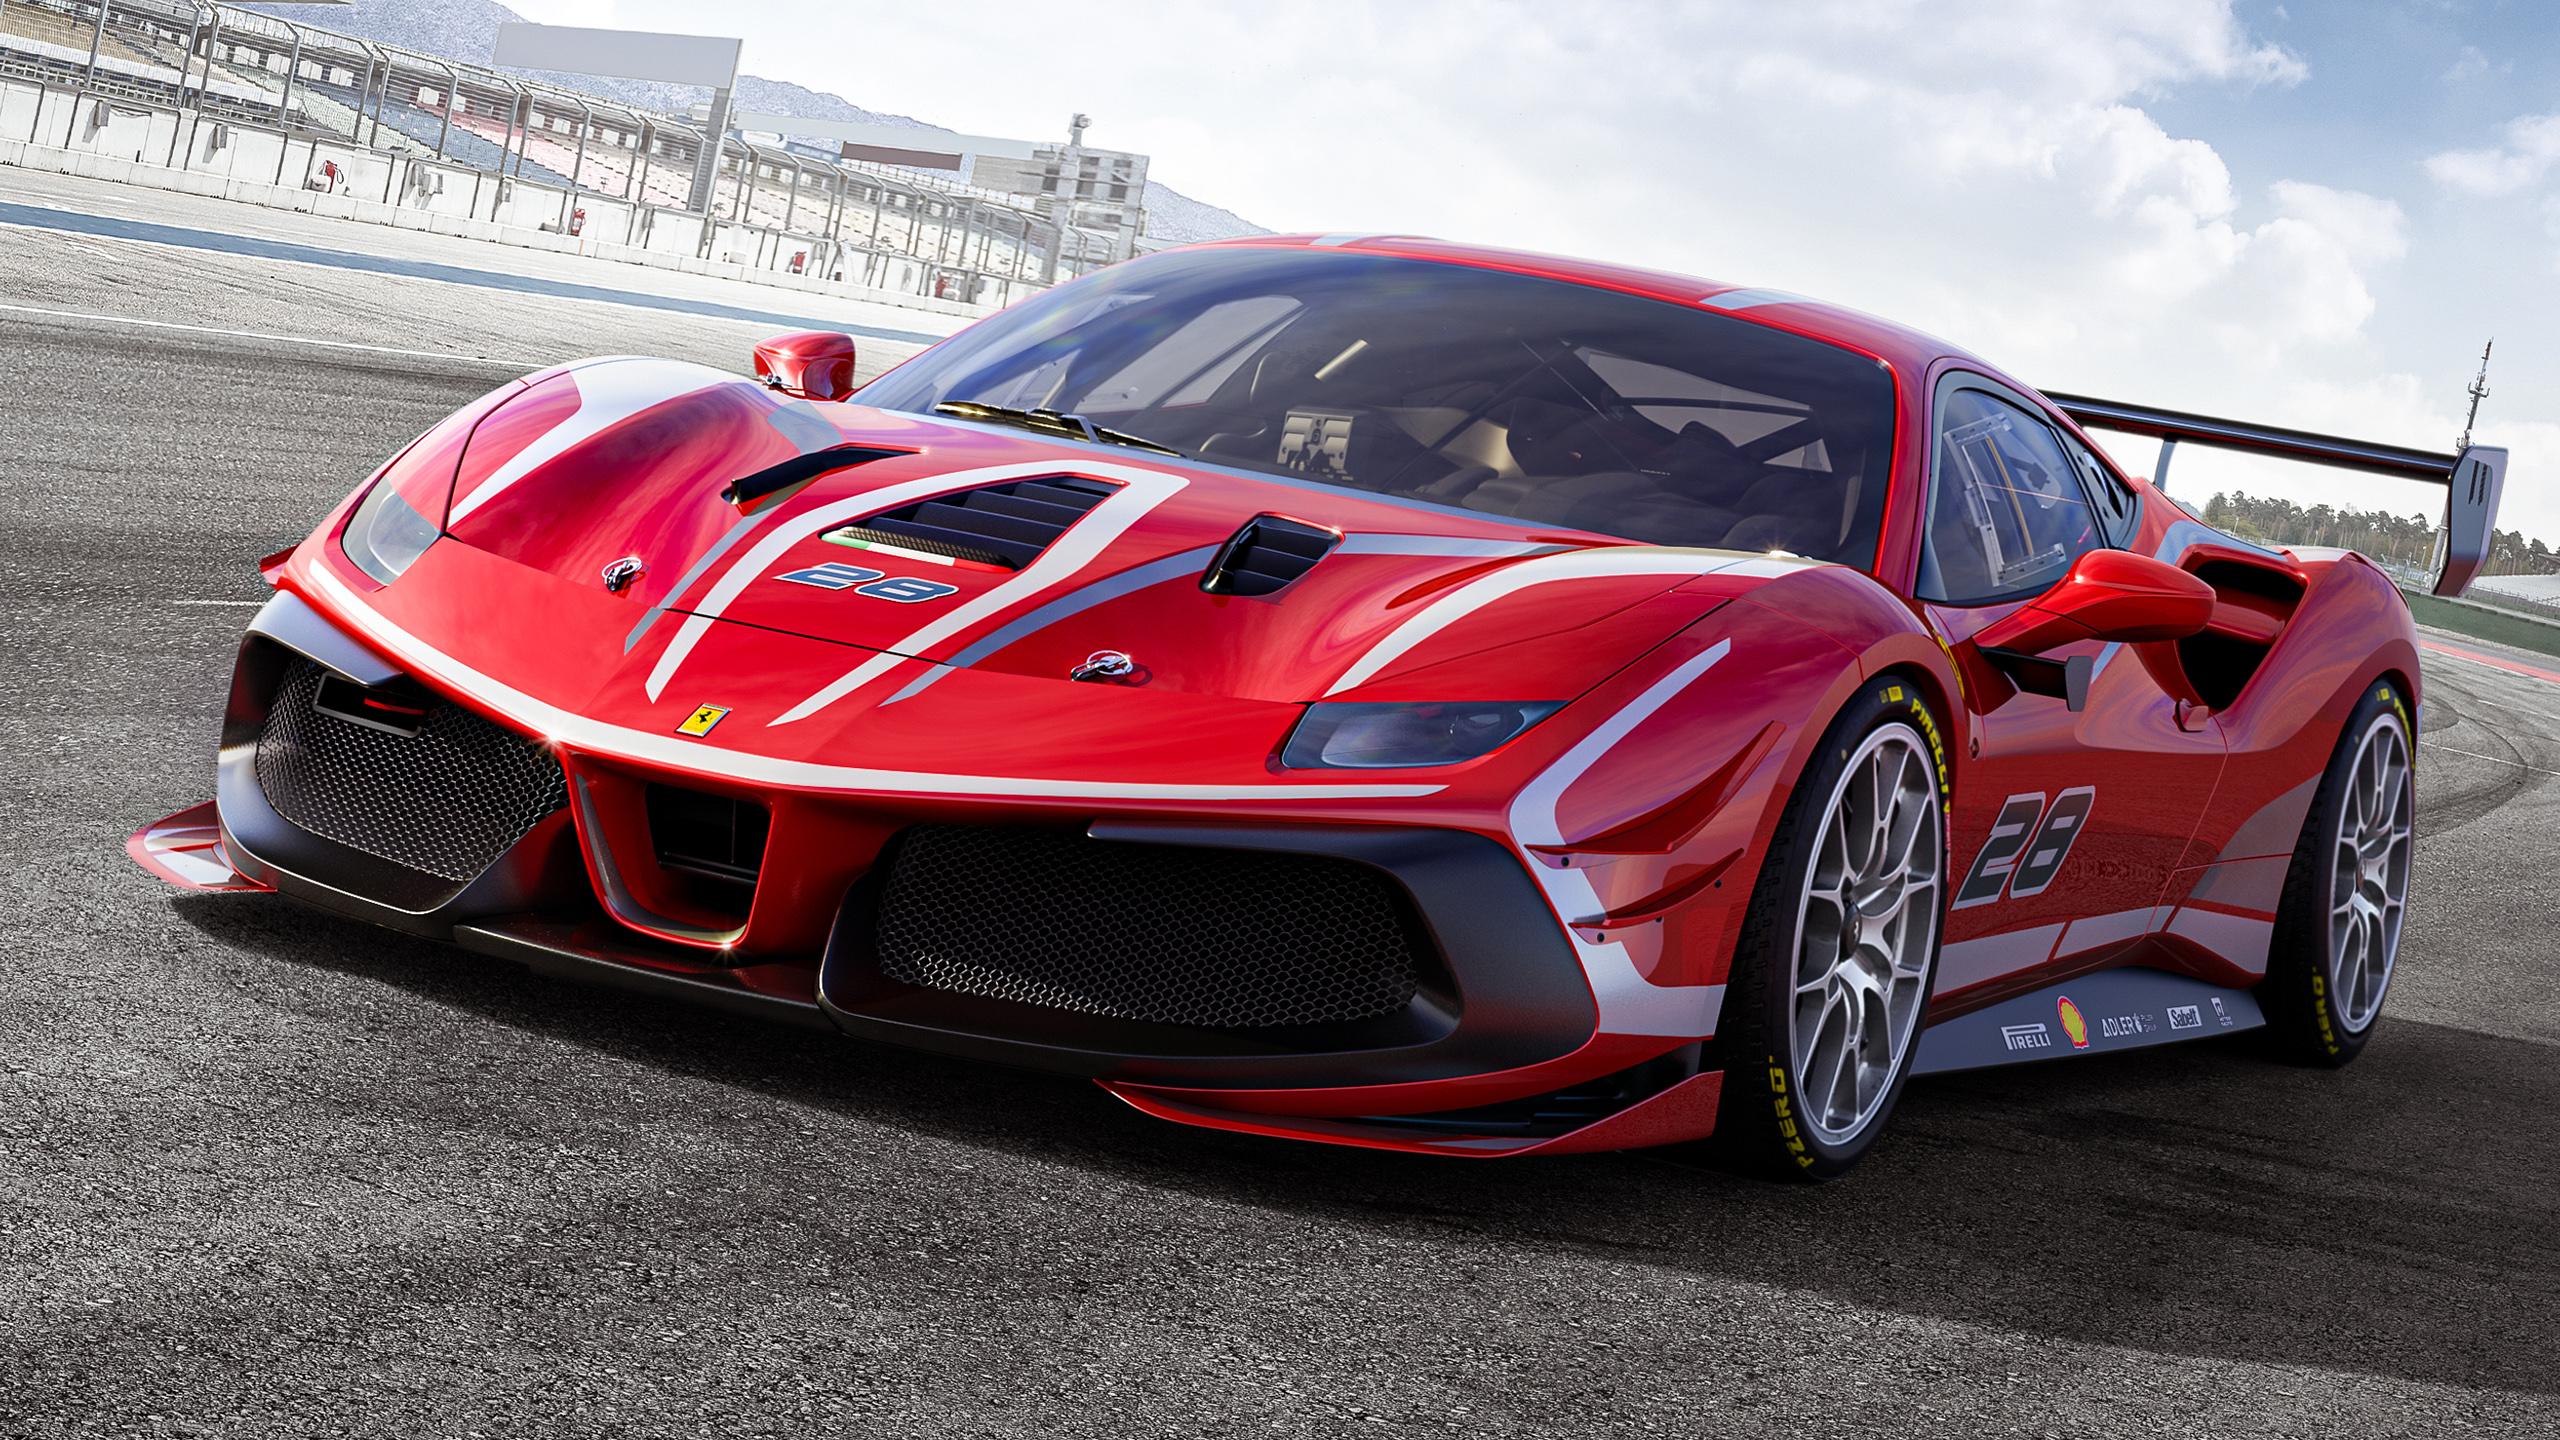 2020 Ferrari 488 Challenge Evo HD Wallpaper Background Image 2560x1440